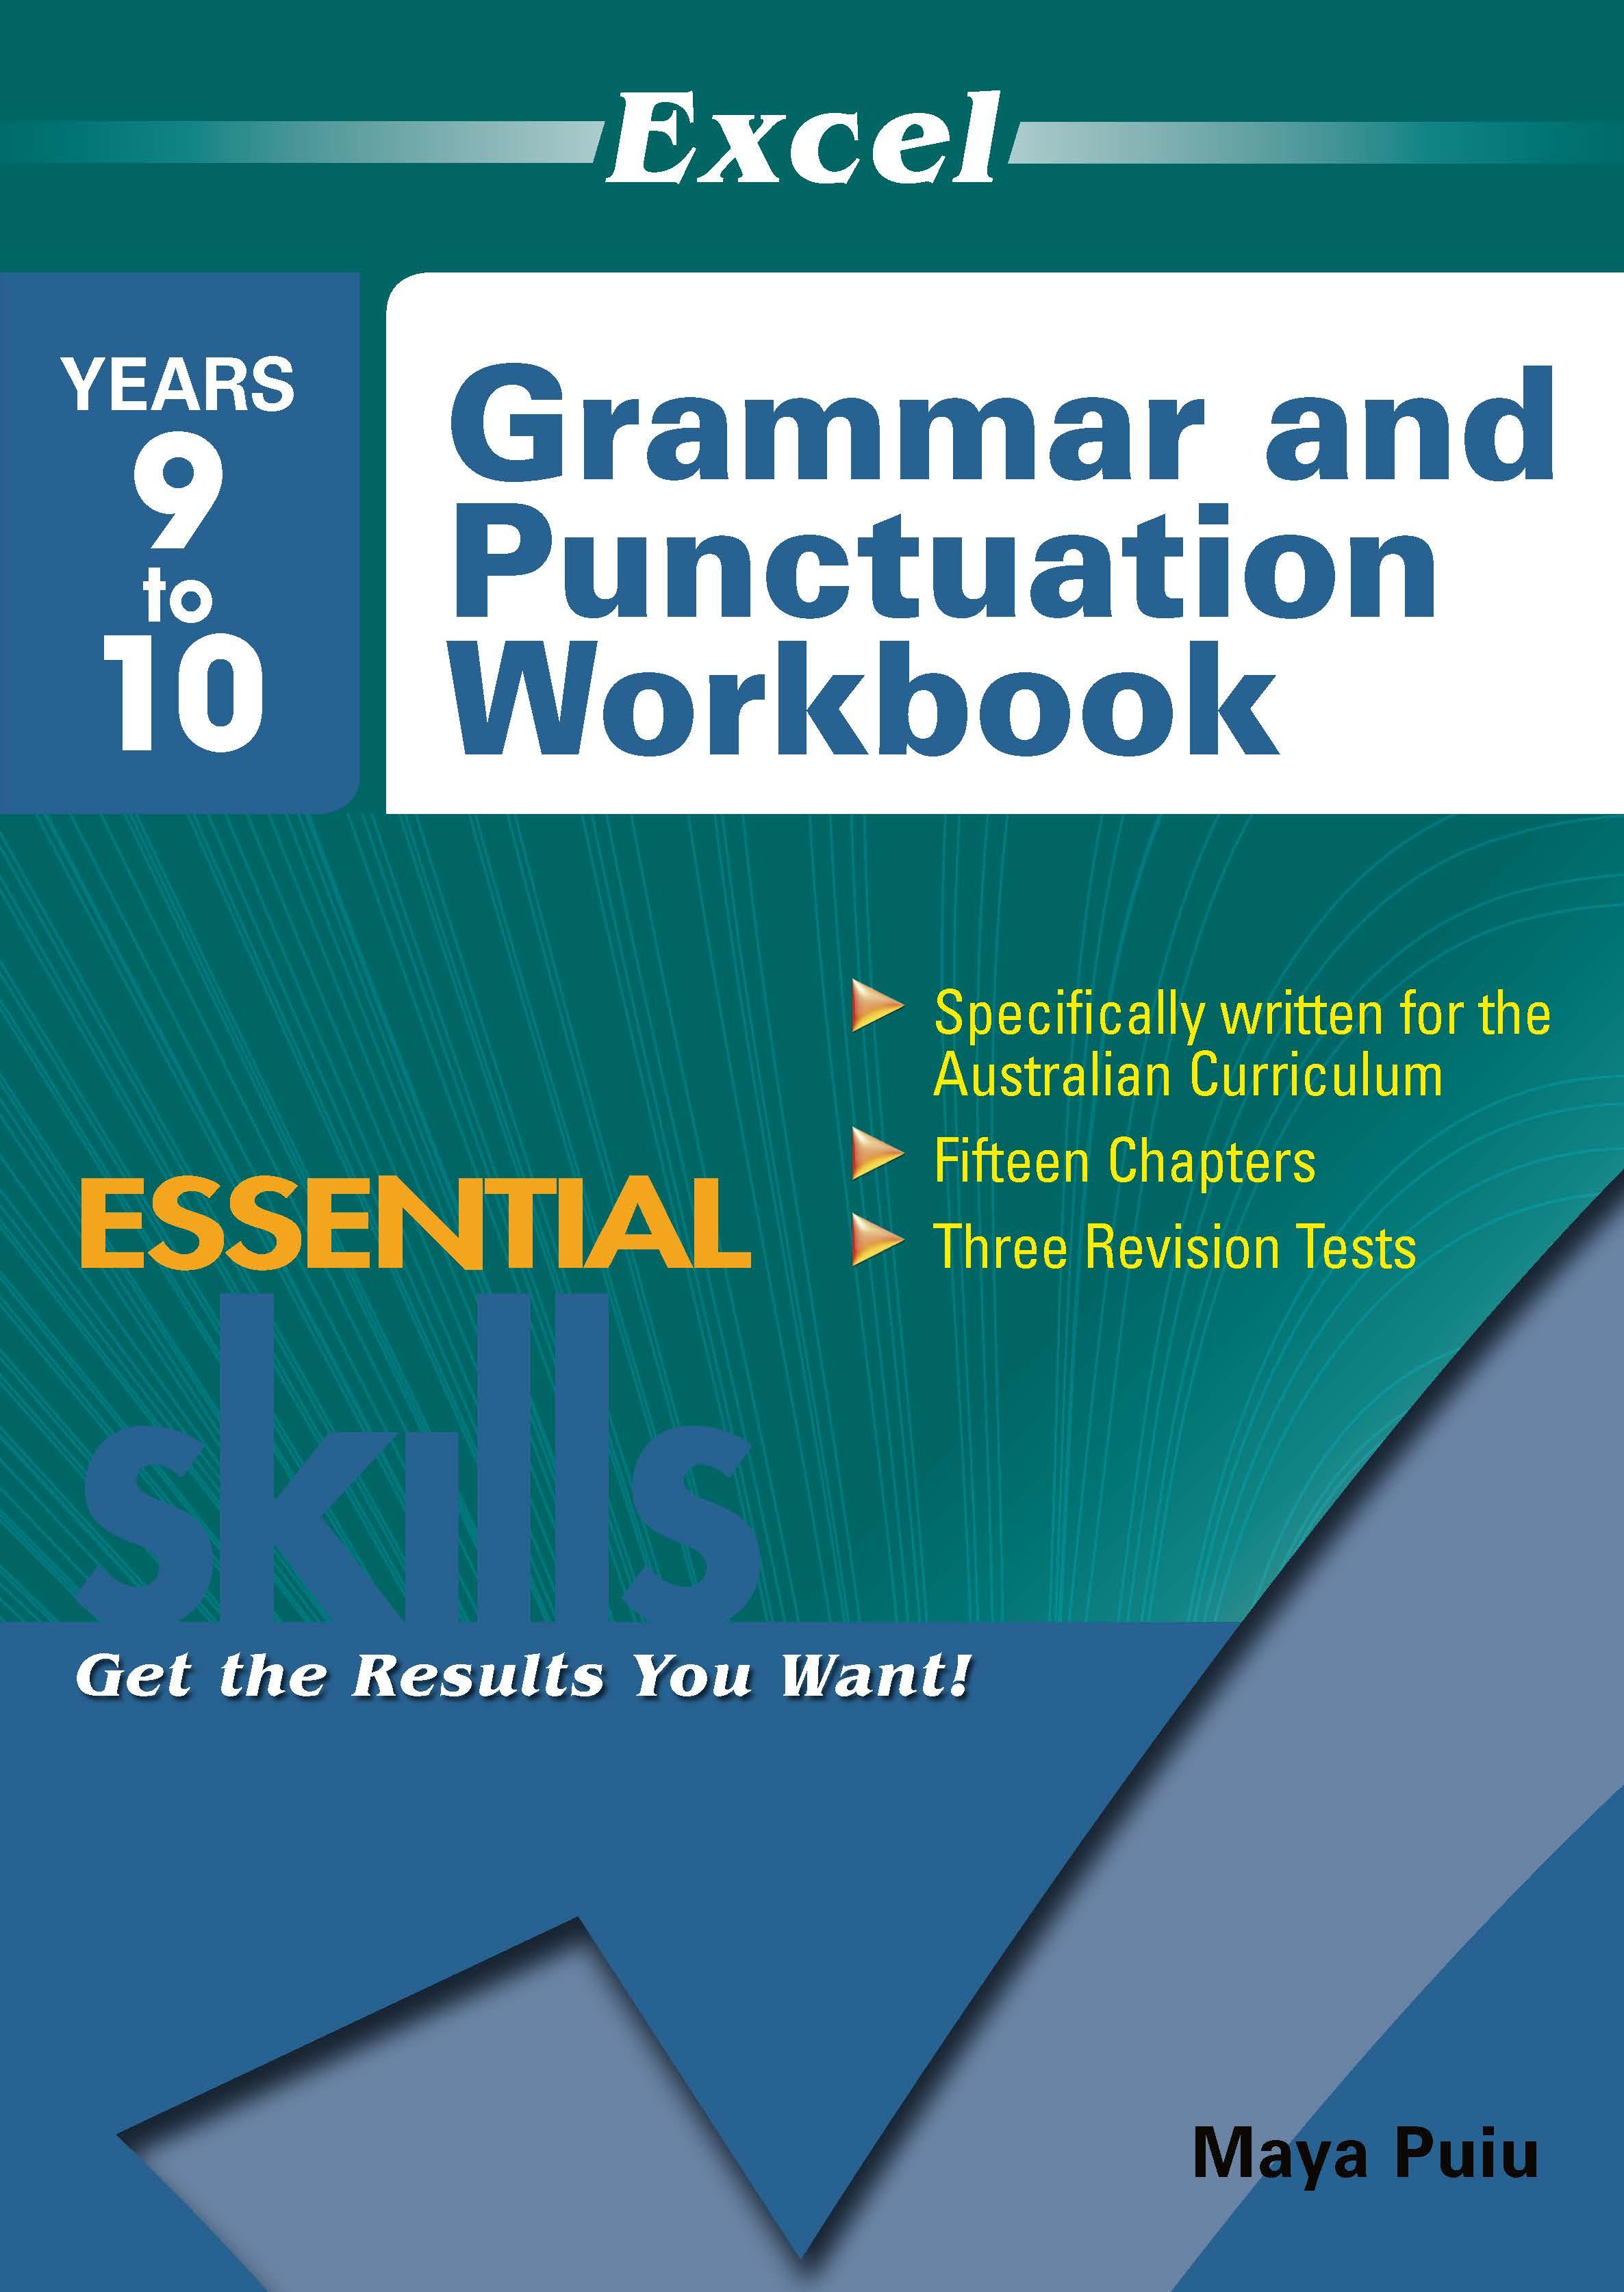 Excel Essential Skills: Grammar and Punctuation Workbook Years 9-10